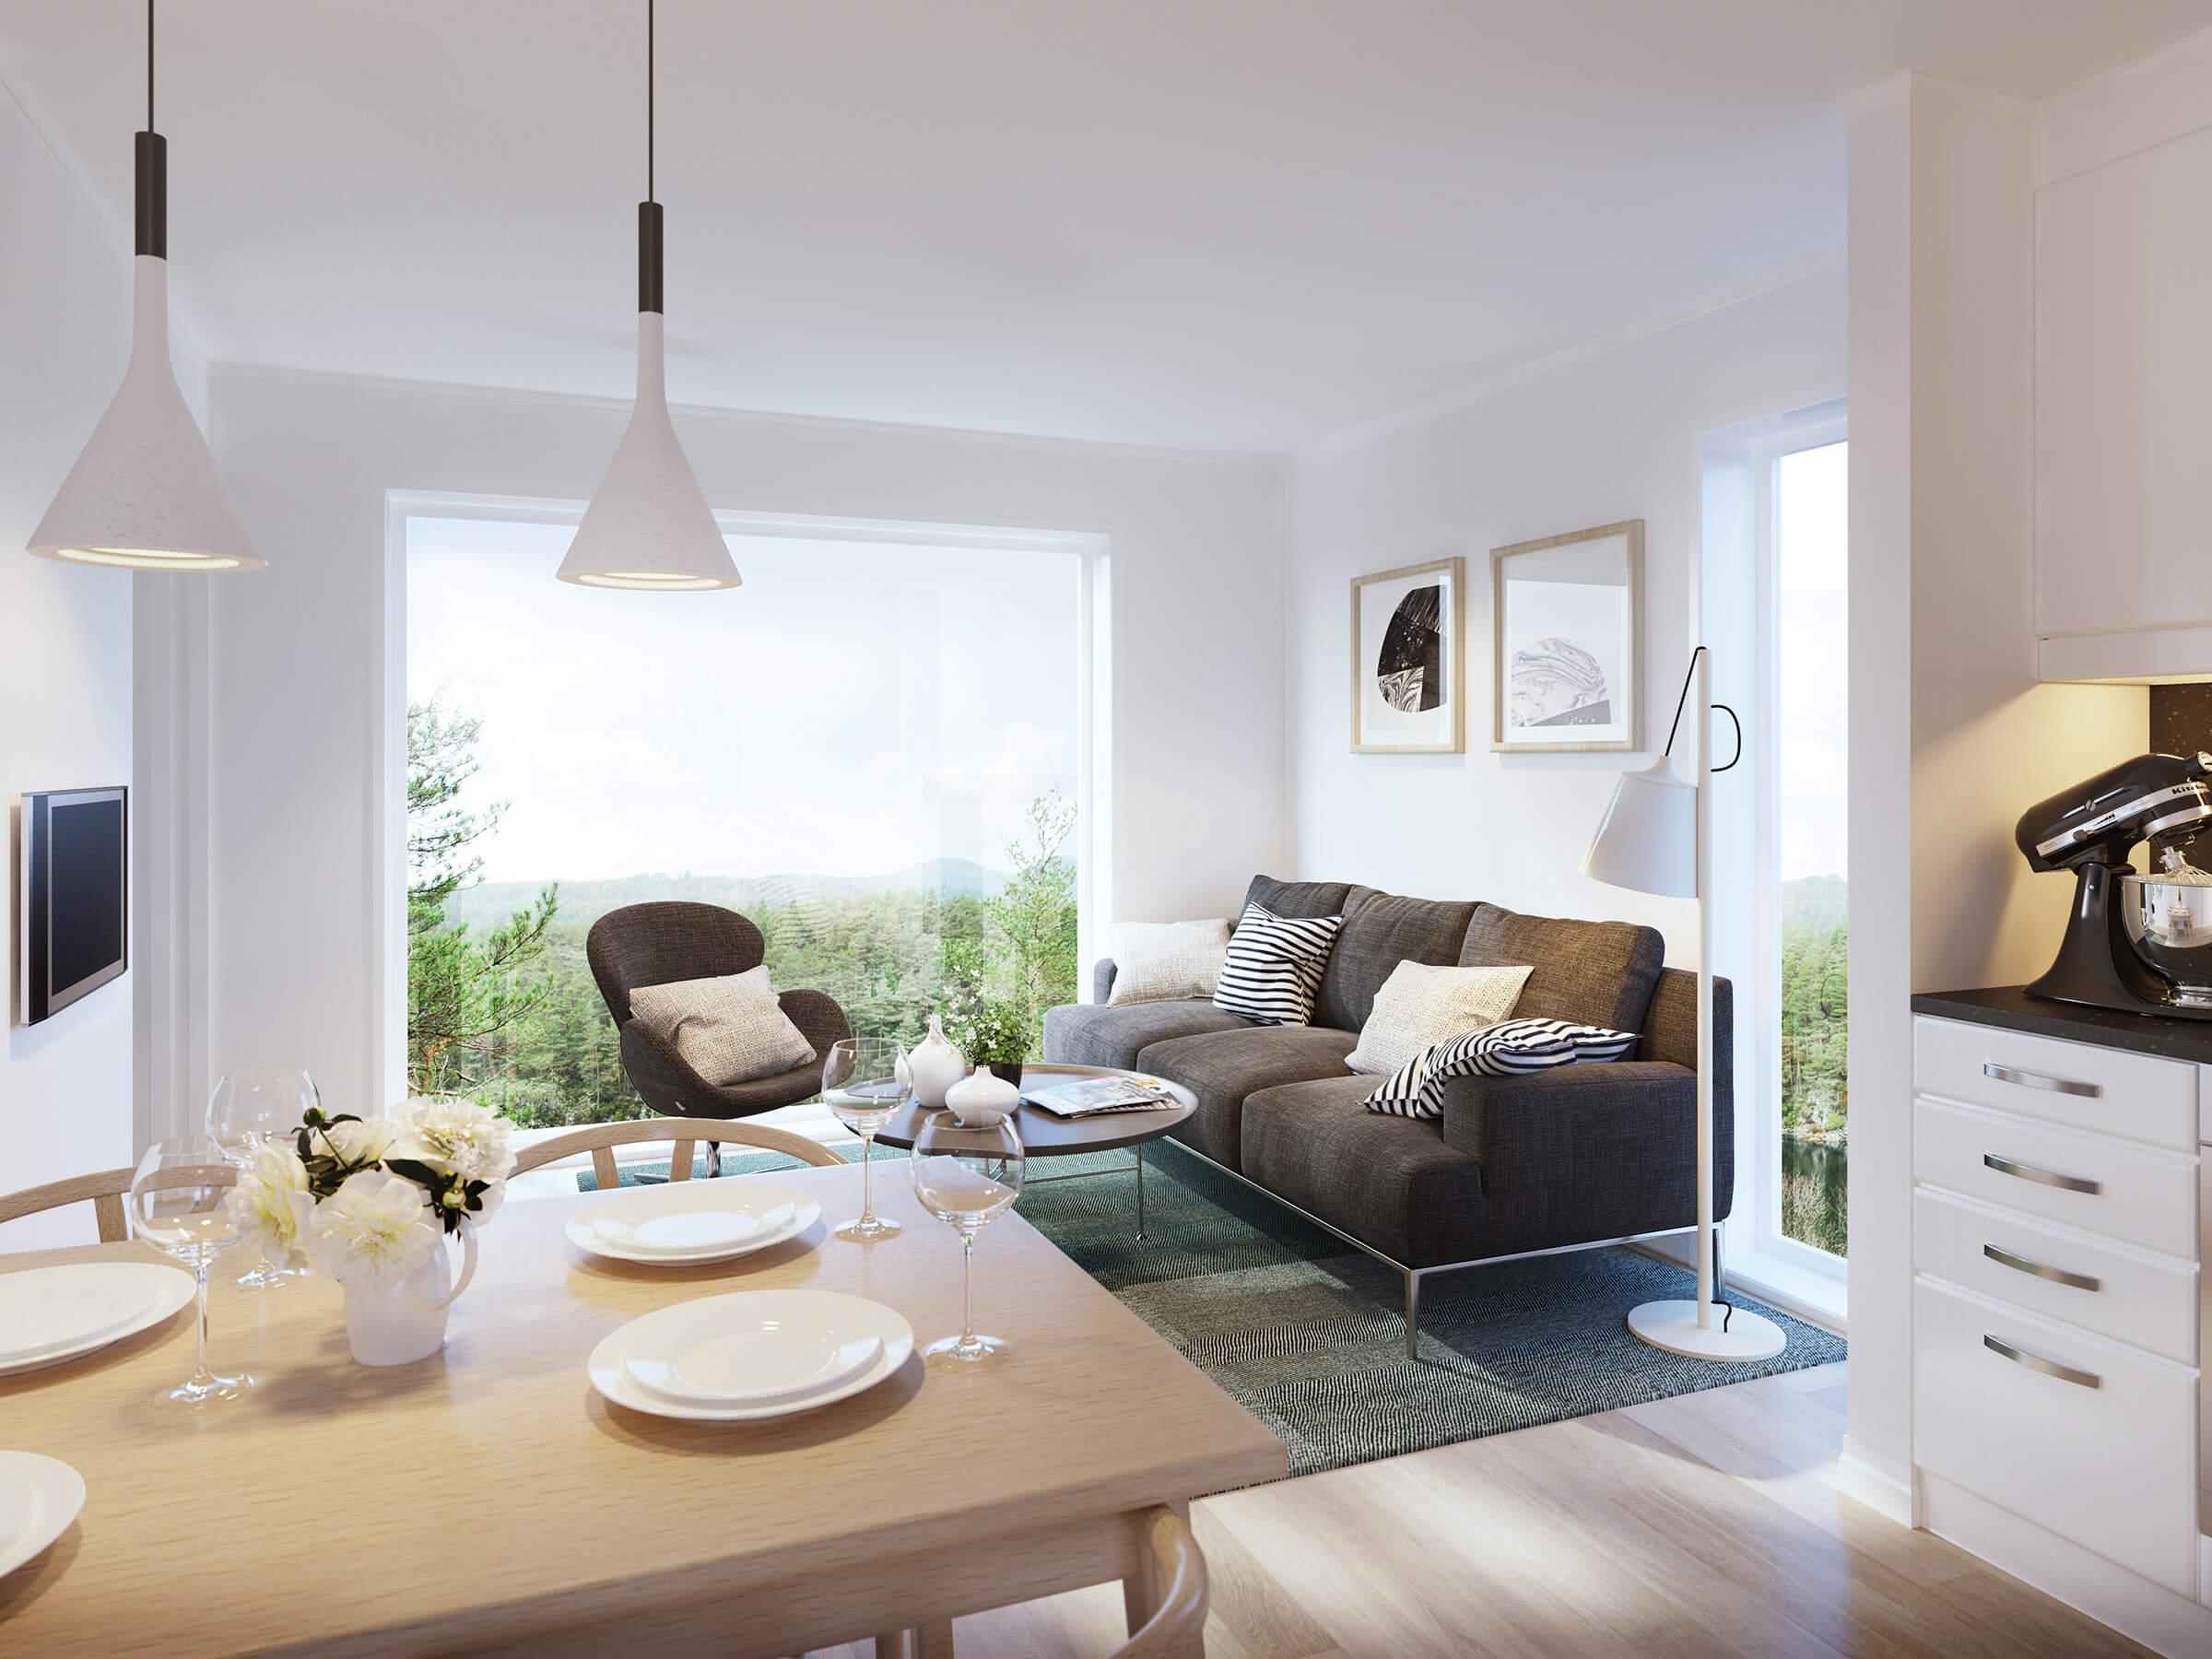 P_13_Livingroom_view02